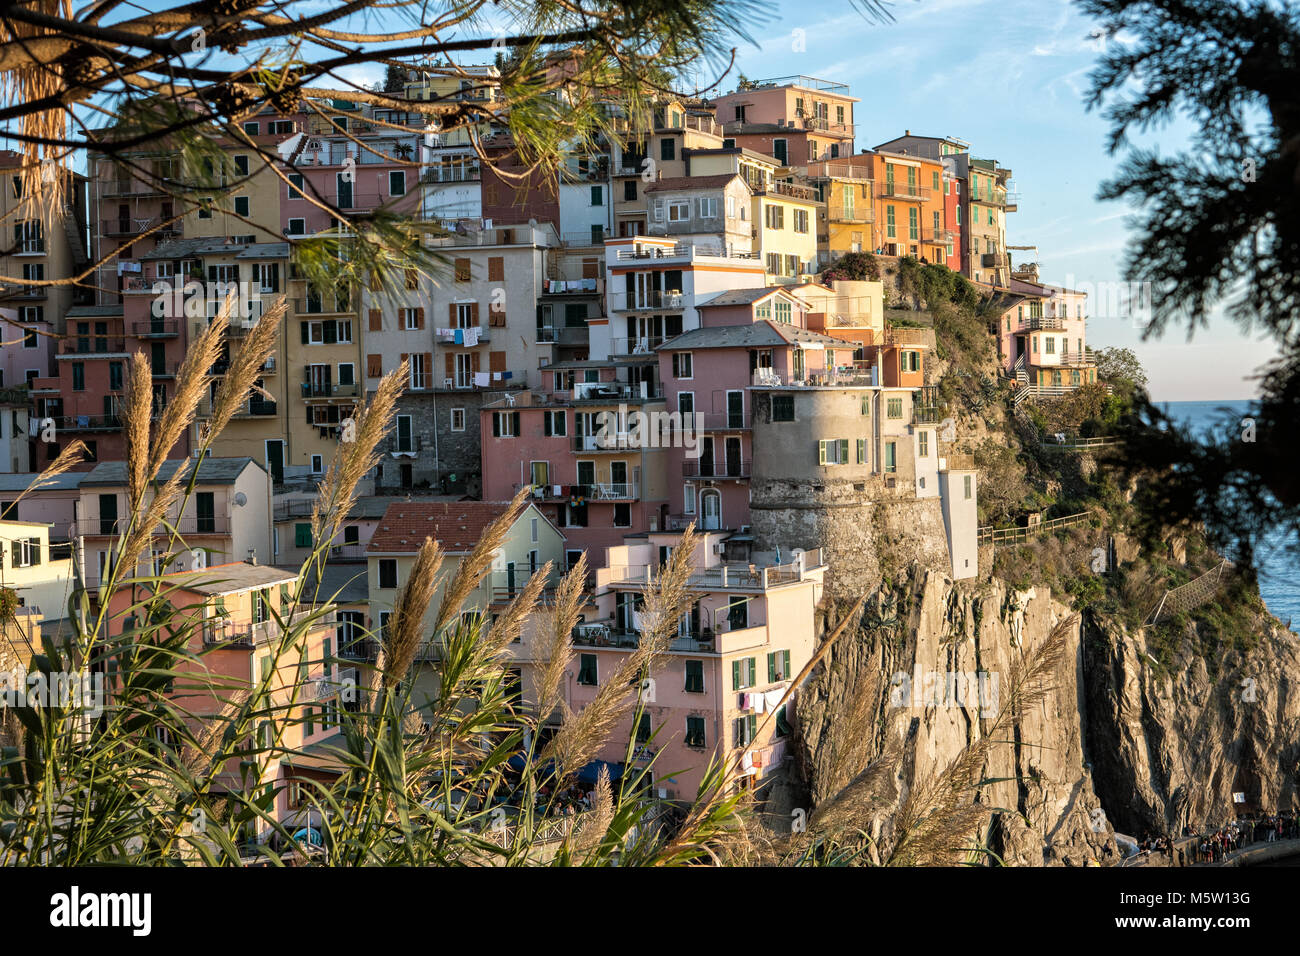 Close up on the village of Manarola in the Cinque Terre, Liguria, Italy Stock Photo